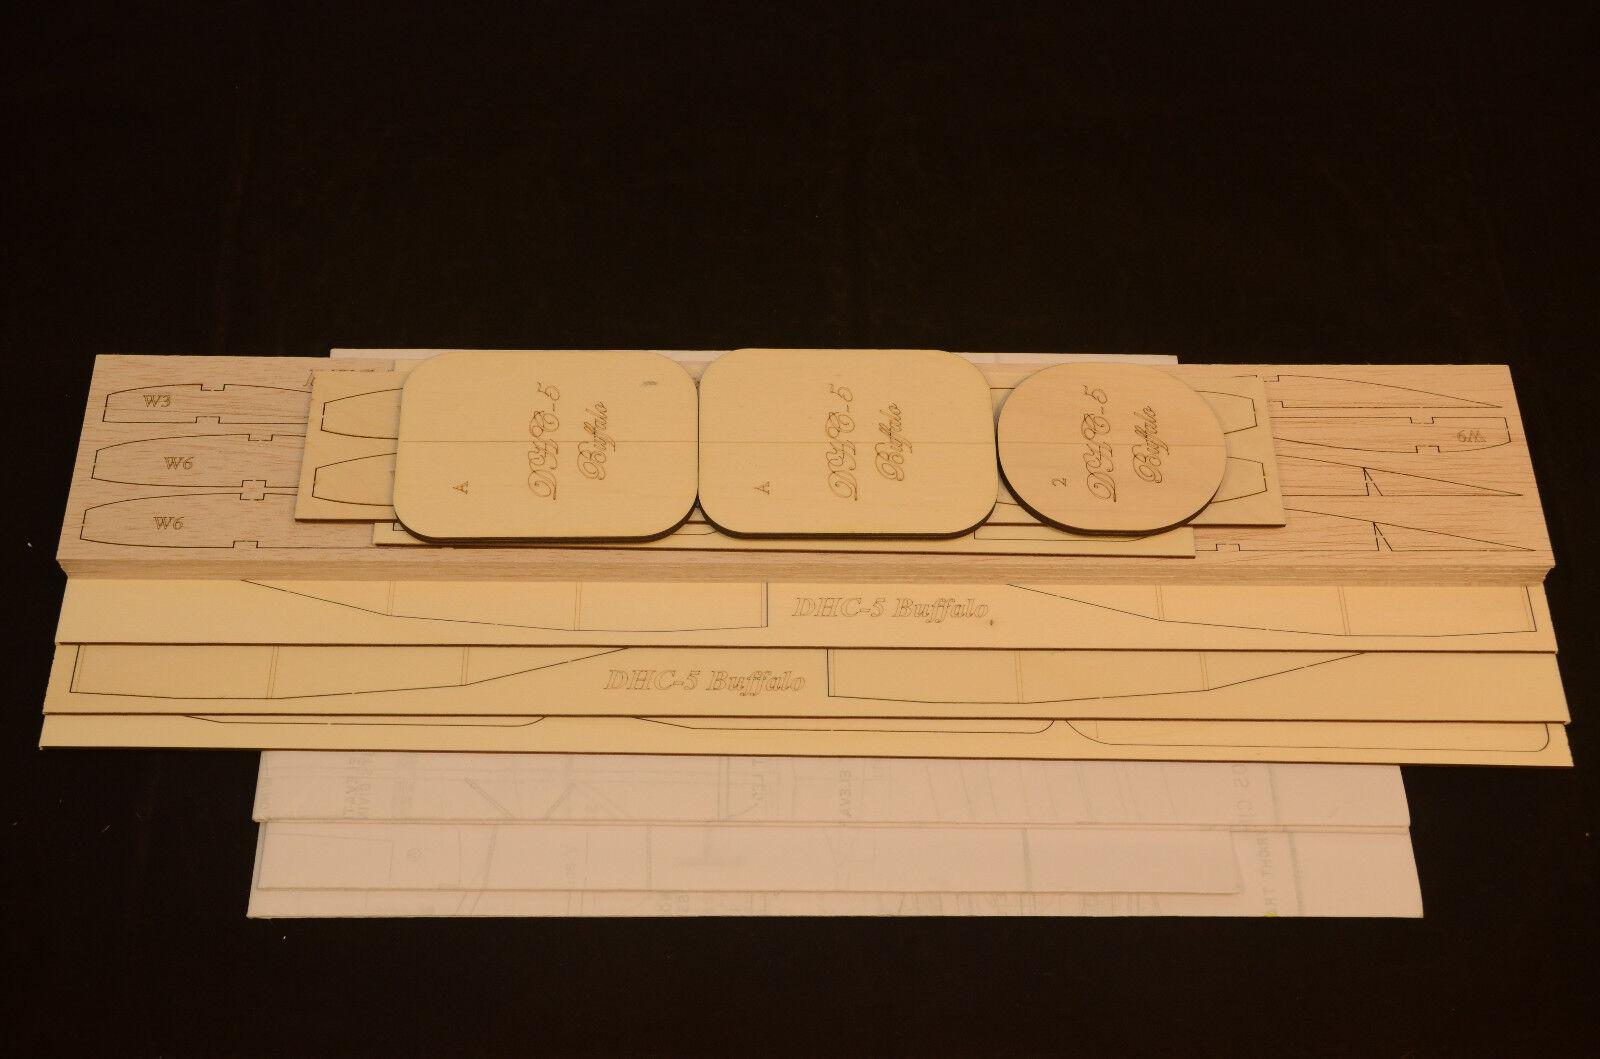 Dehavilland DHC-5 BUFFALO Laser Cut Short Kit & Plans 94 WS Electric or Nitro